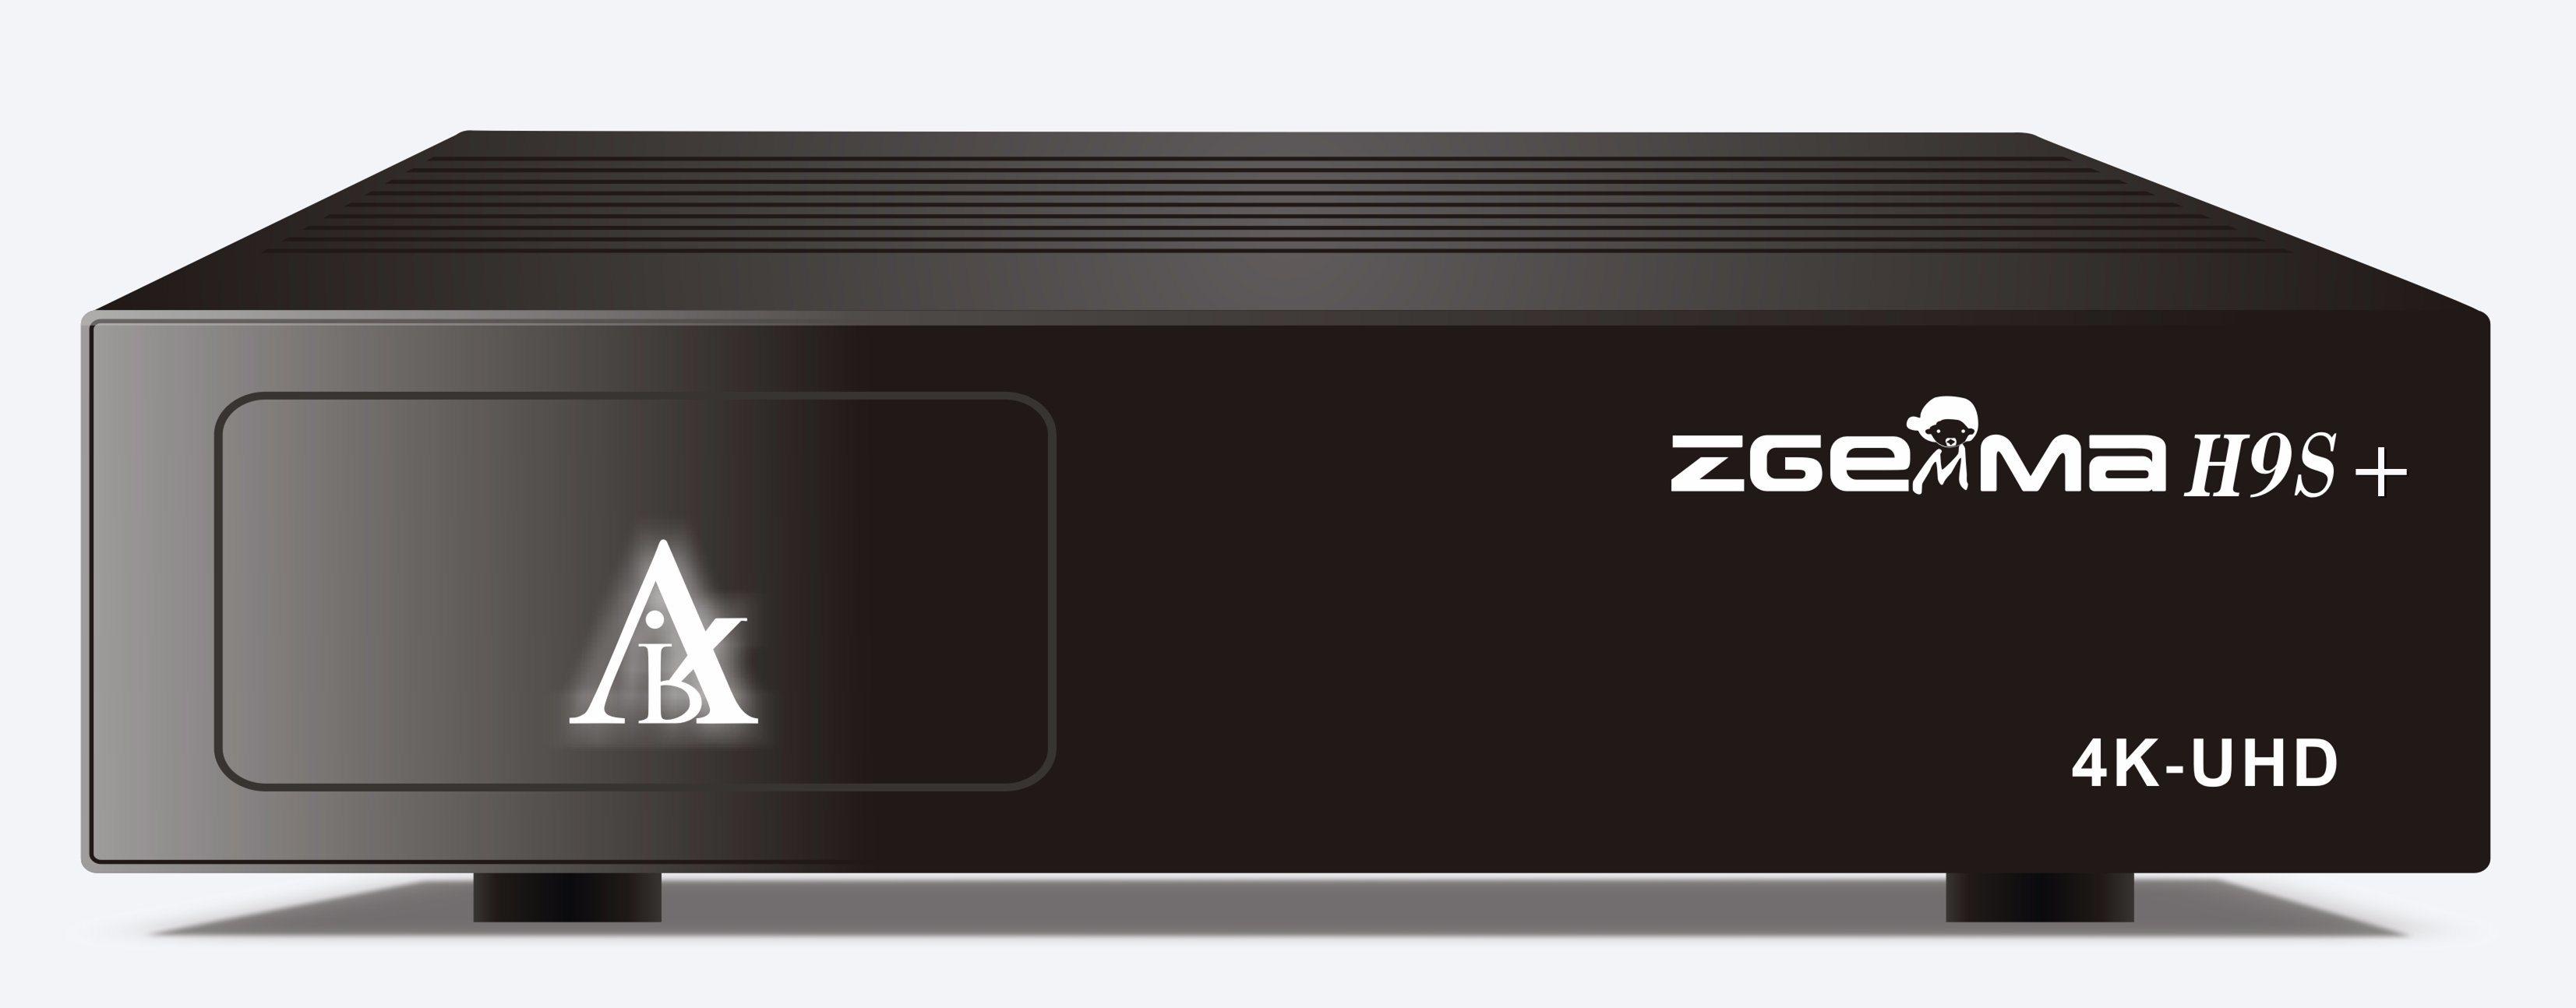 China Zgemma H9s+ DVB-S2X with Ci+ 4K UHD Satellite Receiver - China